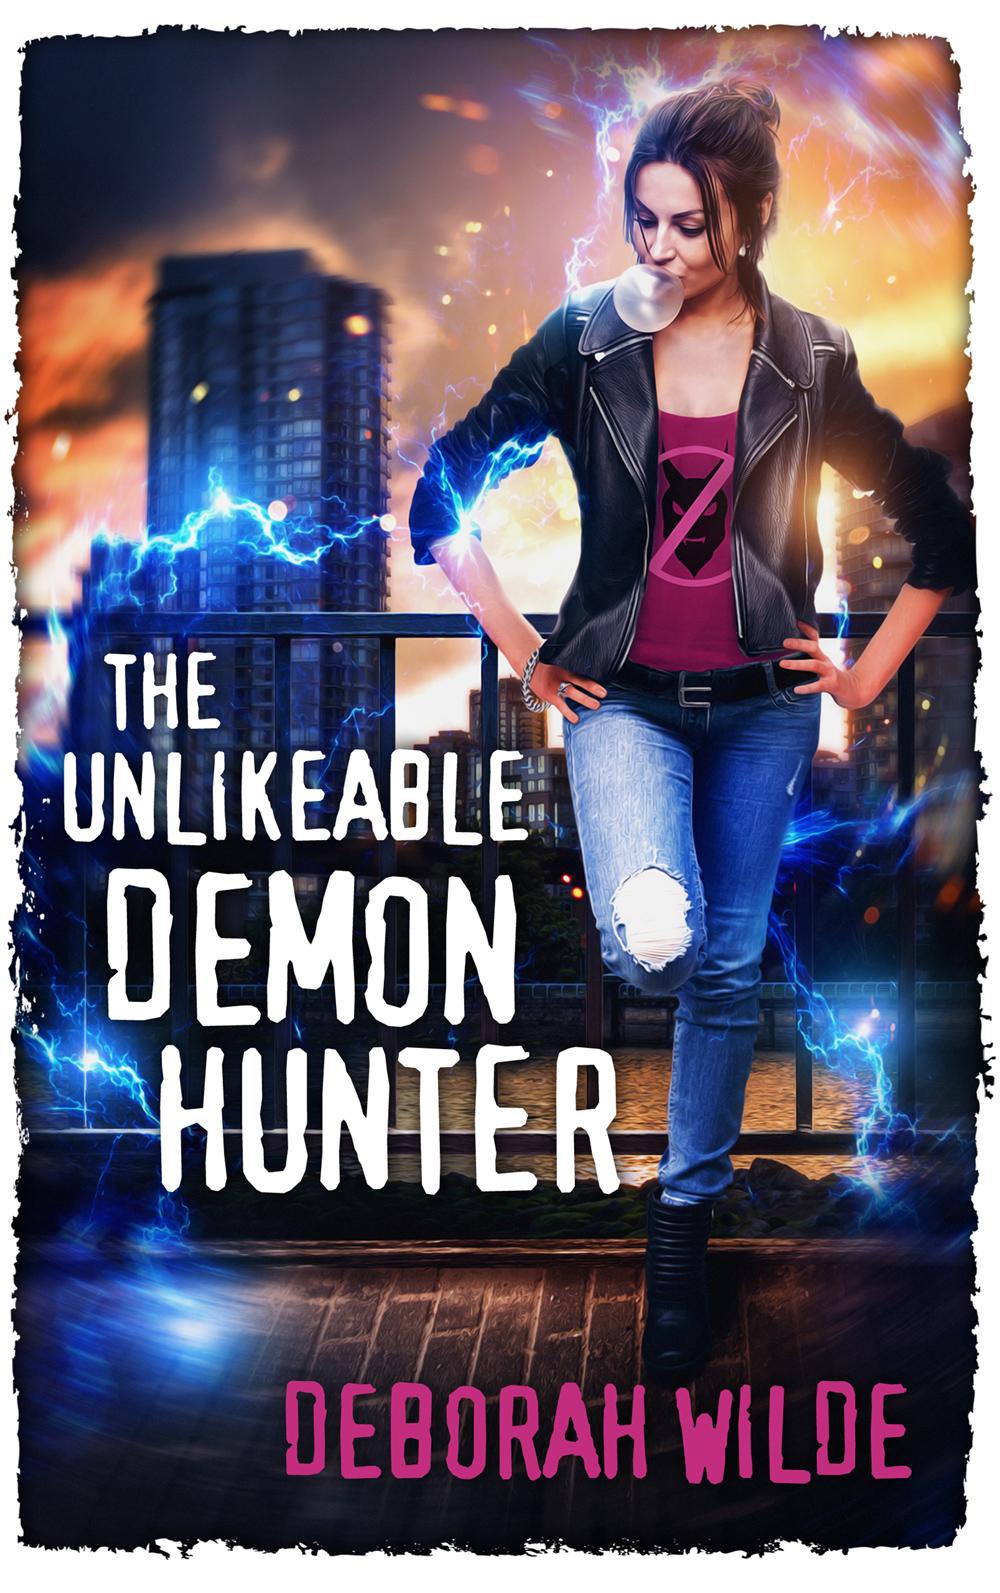 #BlogTour: The Unlikeable Demon Hunter by Deborah Wilde @wildeauthor @InkSlingerPR #Review #Giveaway